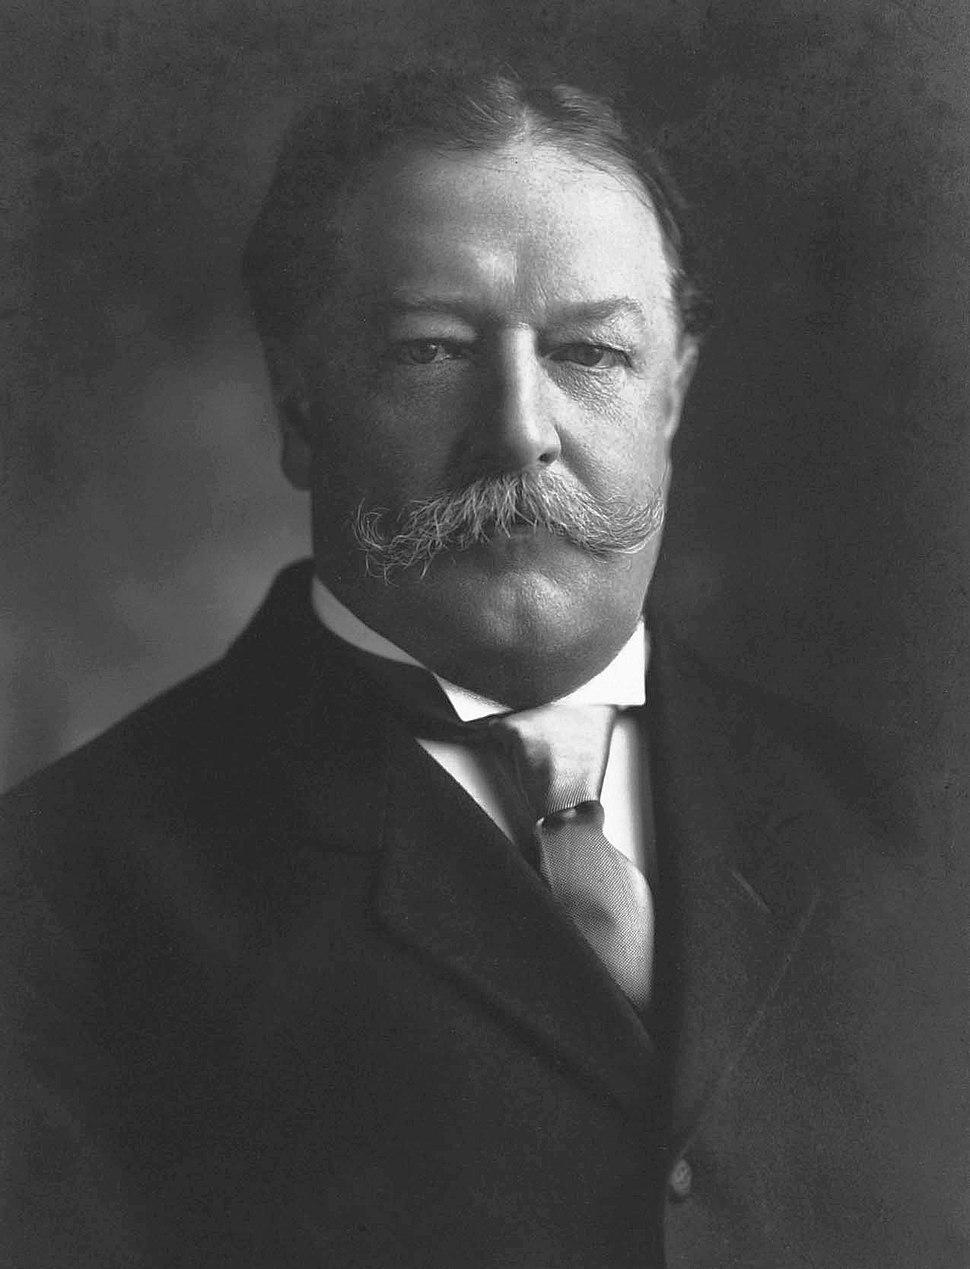 William Howard Taft - Harris and Ewing